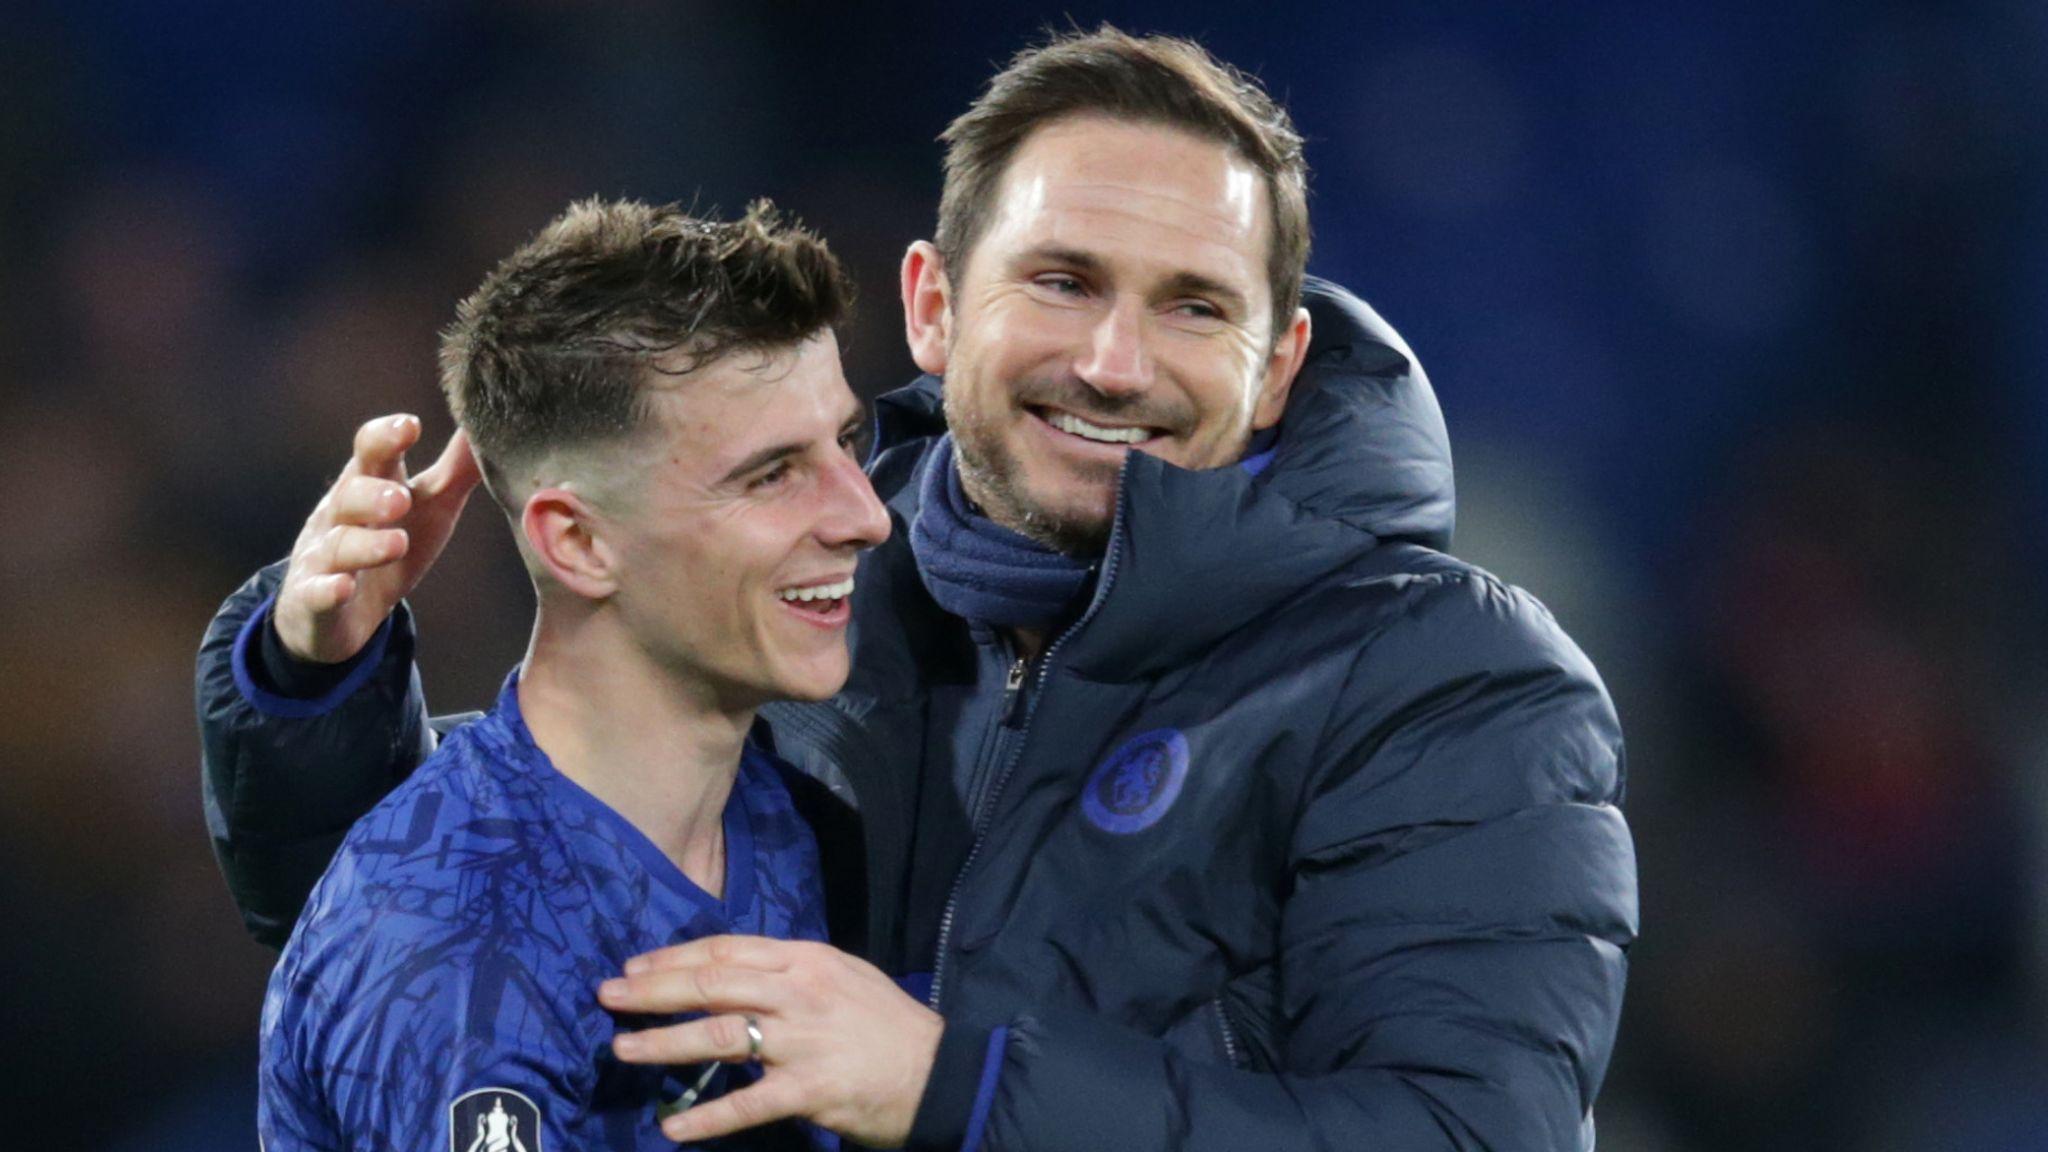 Frank Lampard has faith in Chelsea's Mason Mount | Football News | Sky  Sports